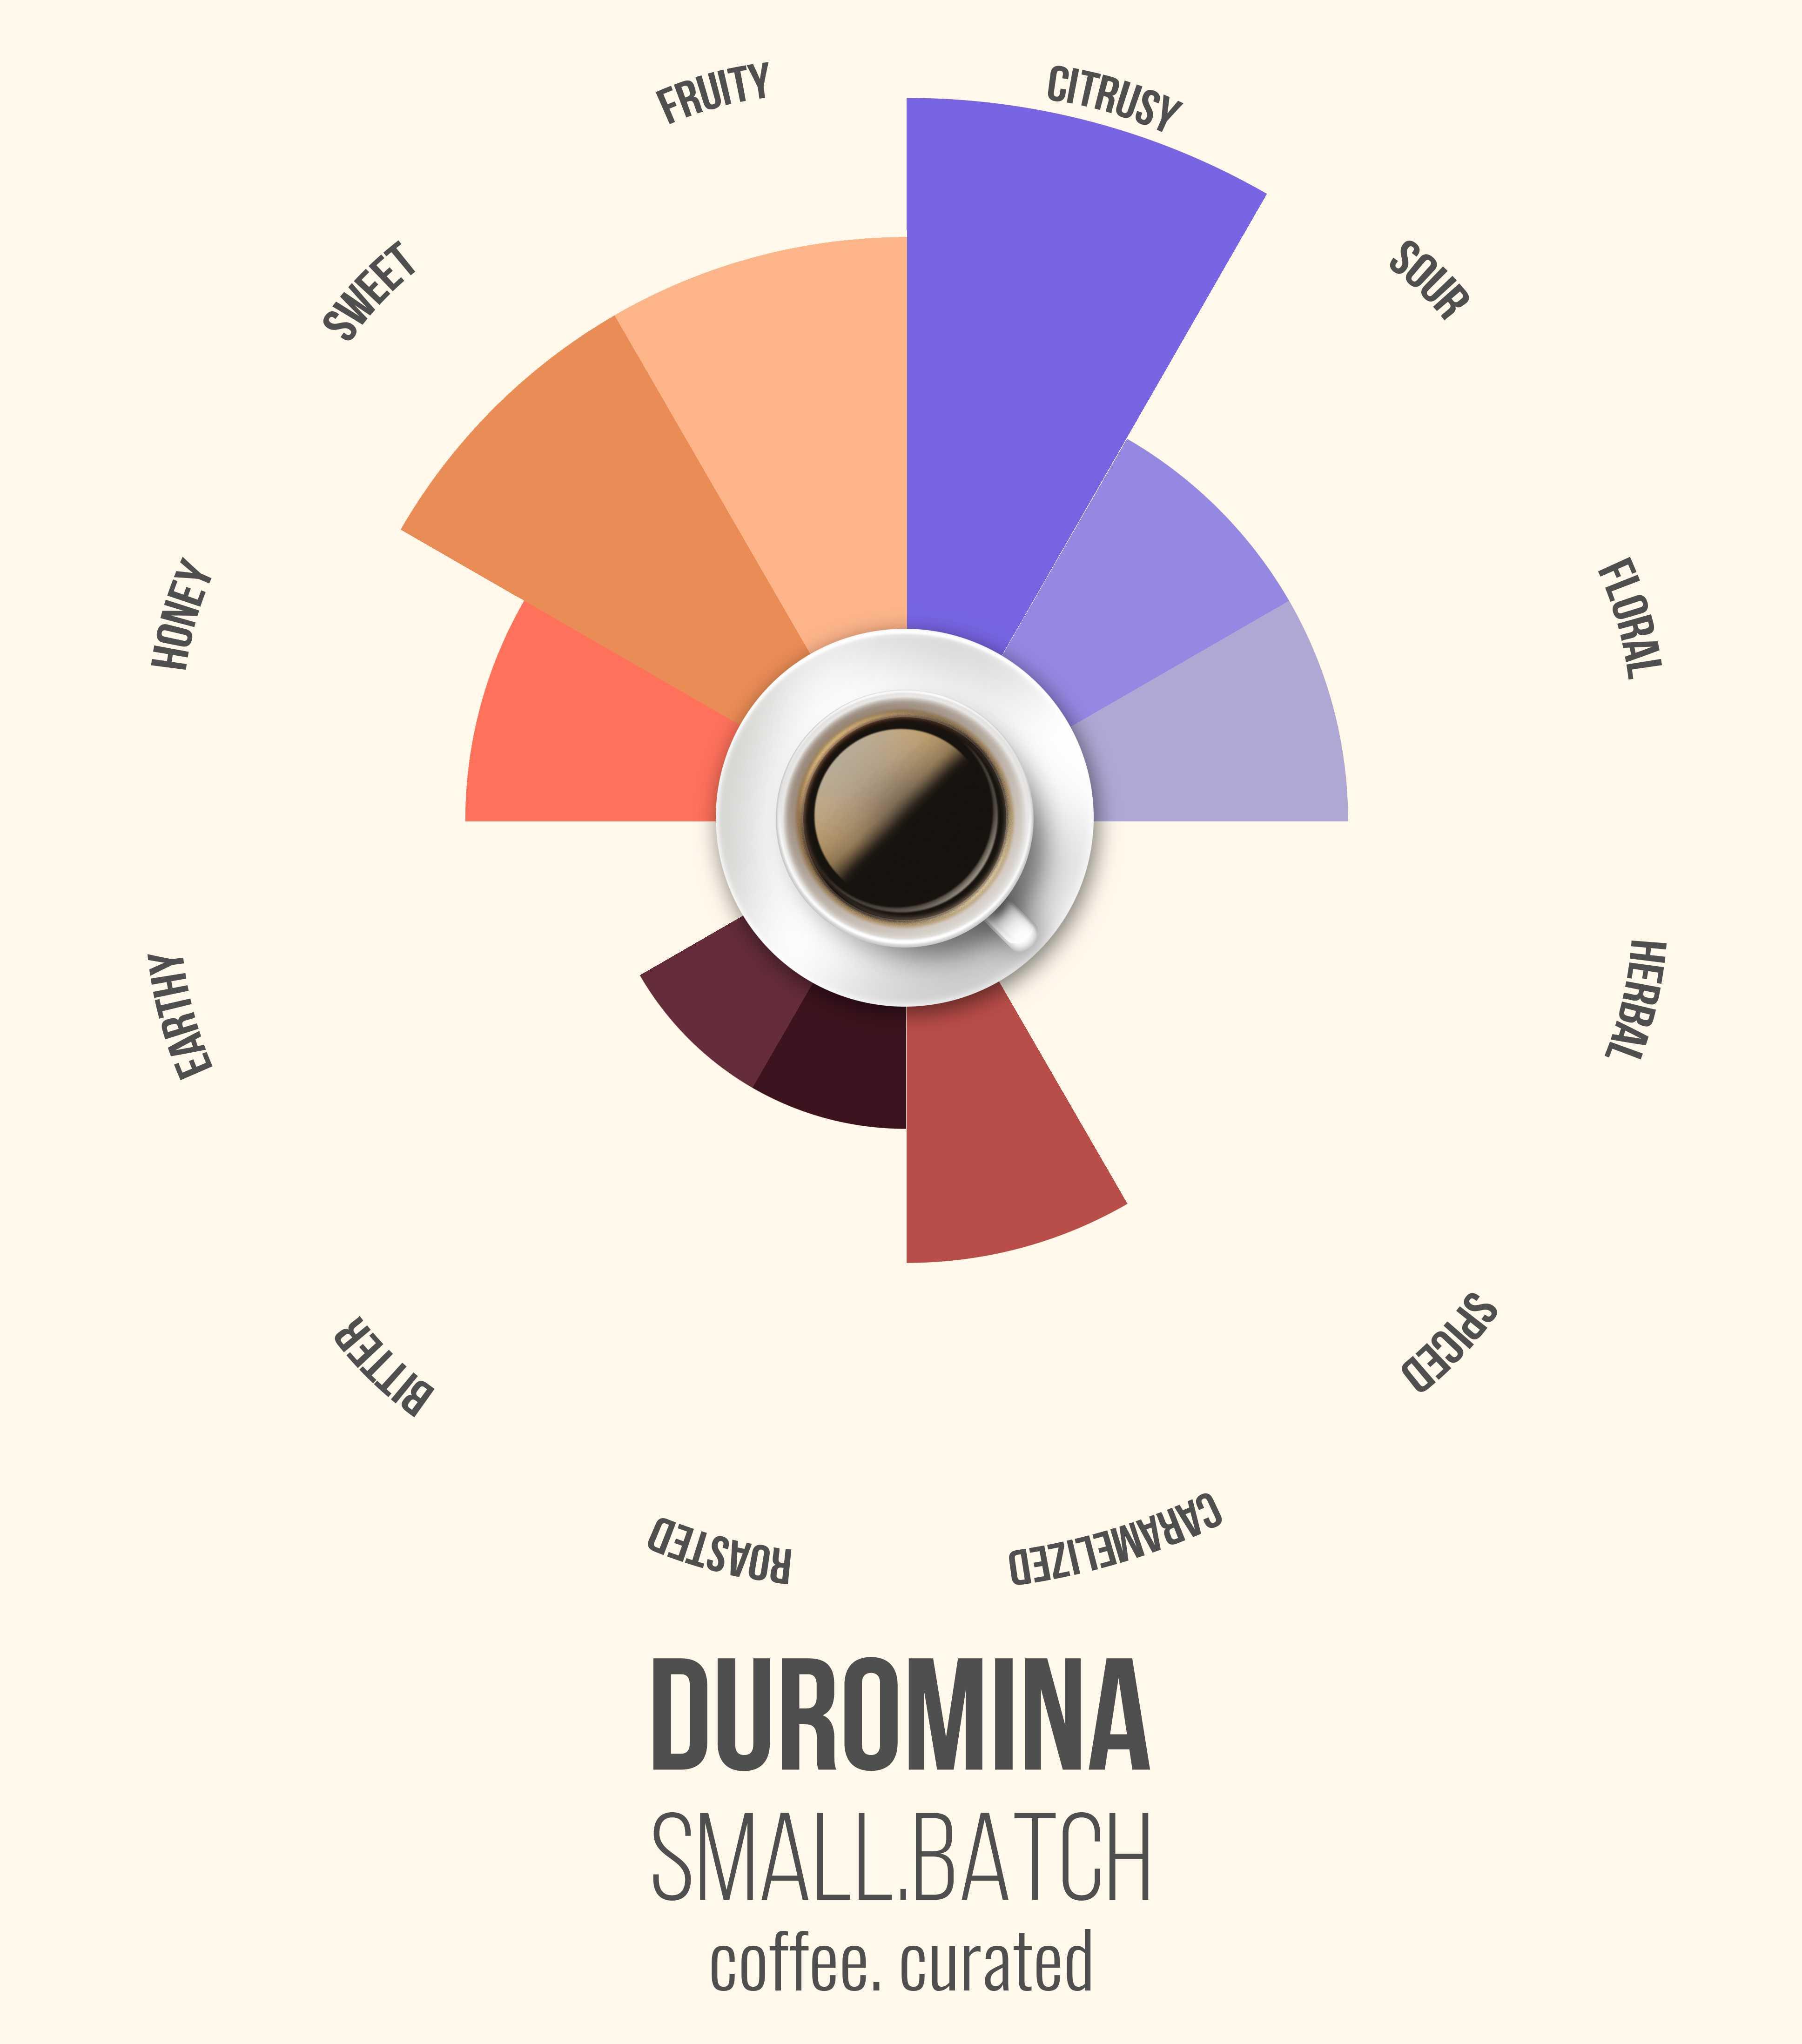 Small Batch DURMOMINA coffee